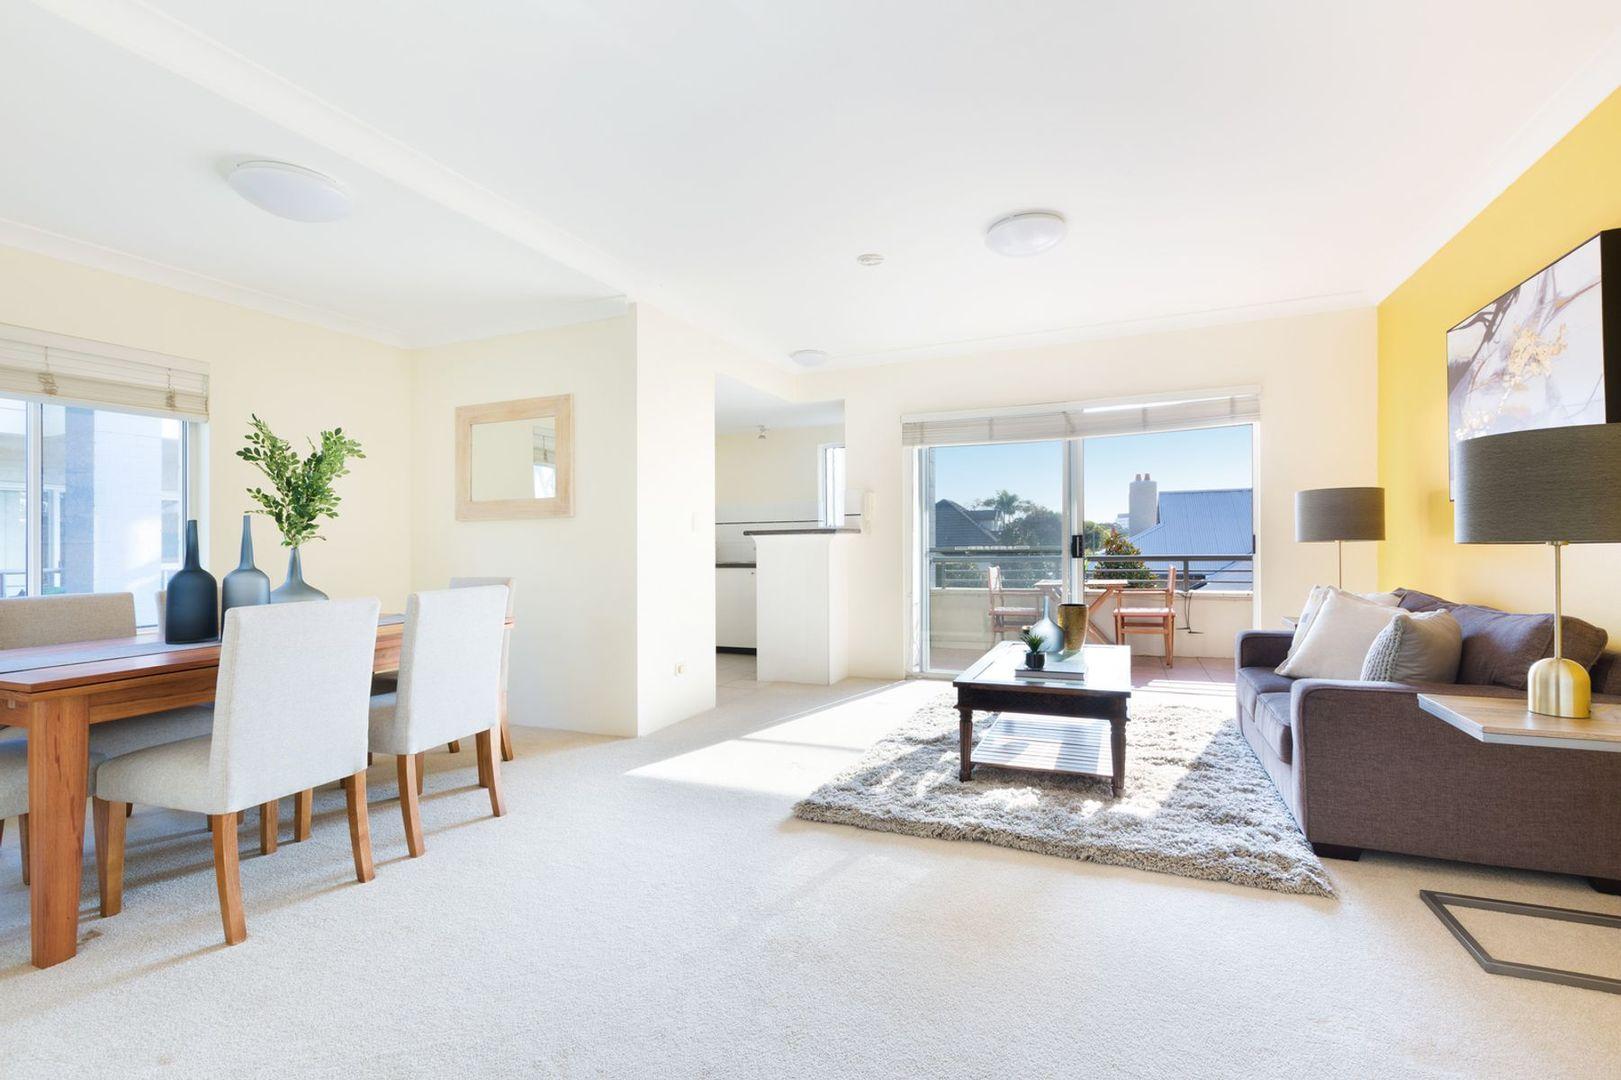 46/252 Willoughby Road, Naremburn NSW 2065, Image 0